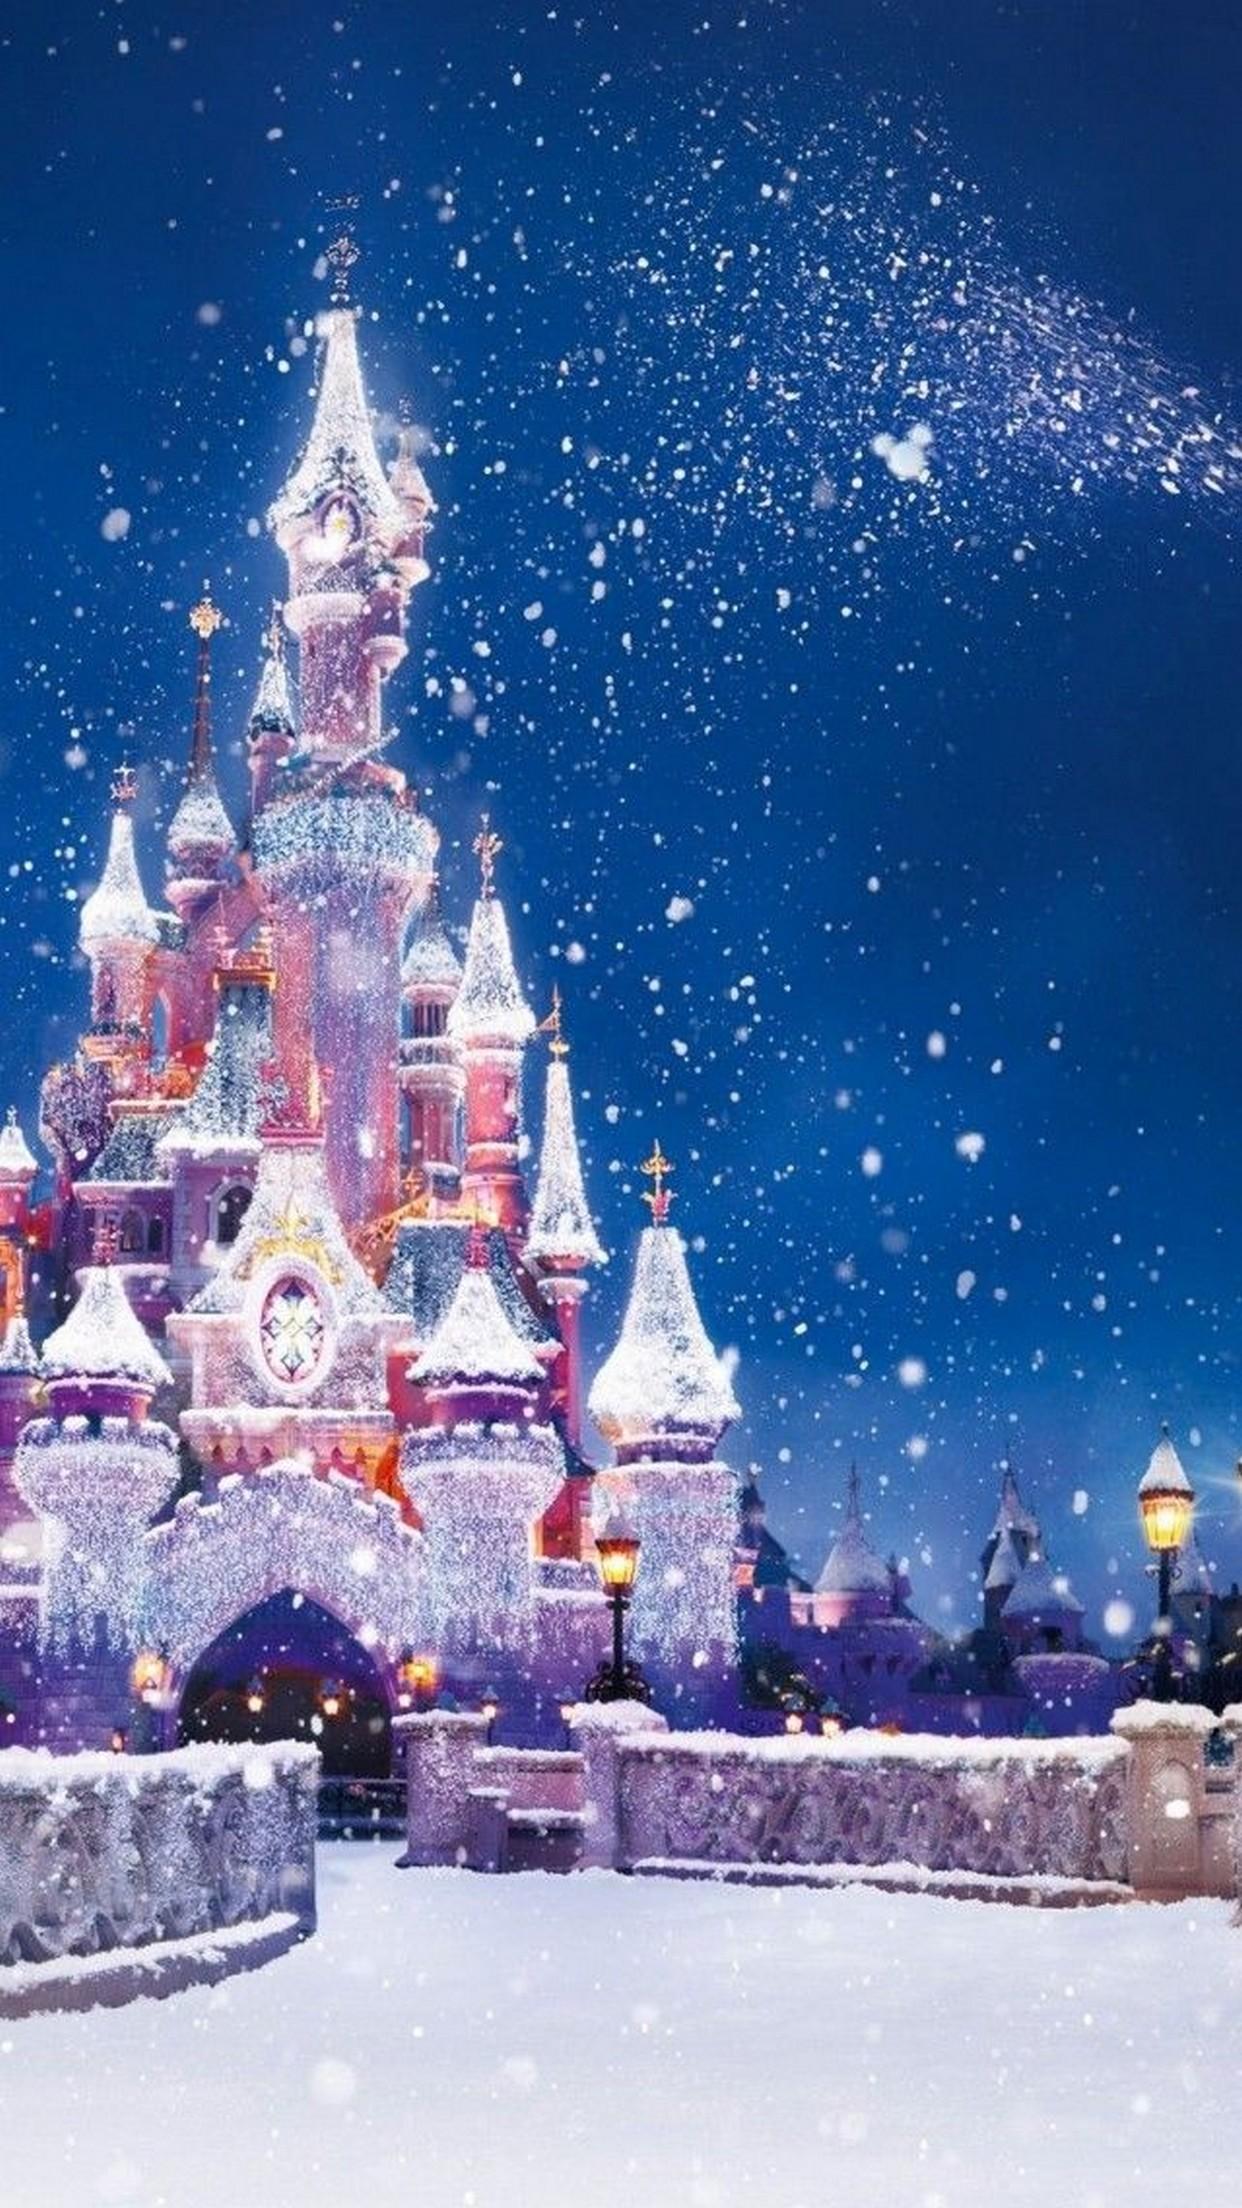 1080x1920 2014 Disney Anna Kristoff Sven Olaf Halloween Frozen IPhone 6 Plus Wallpapers